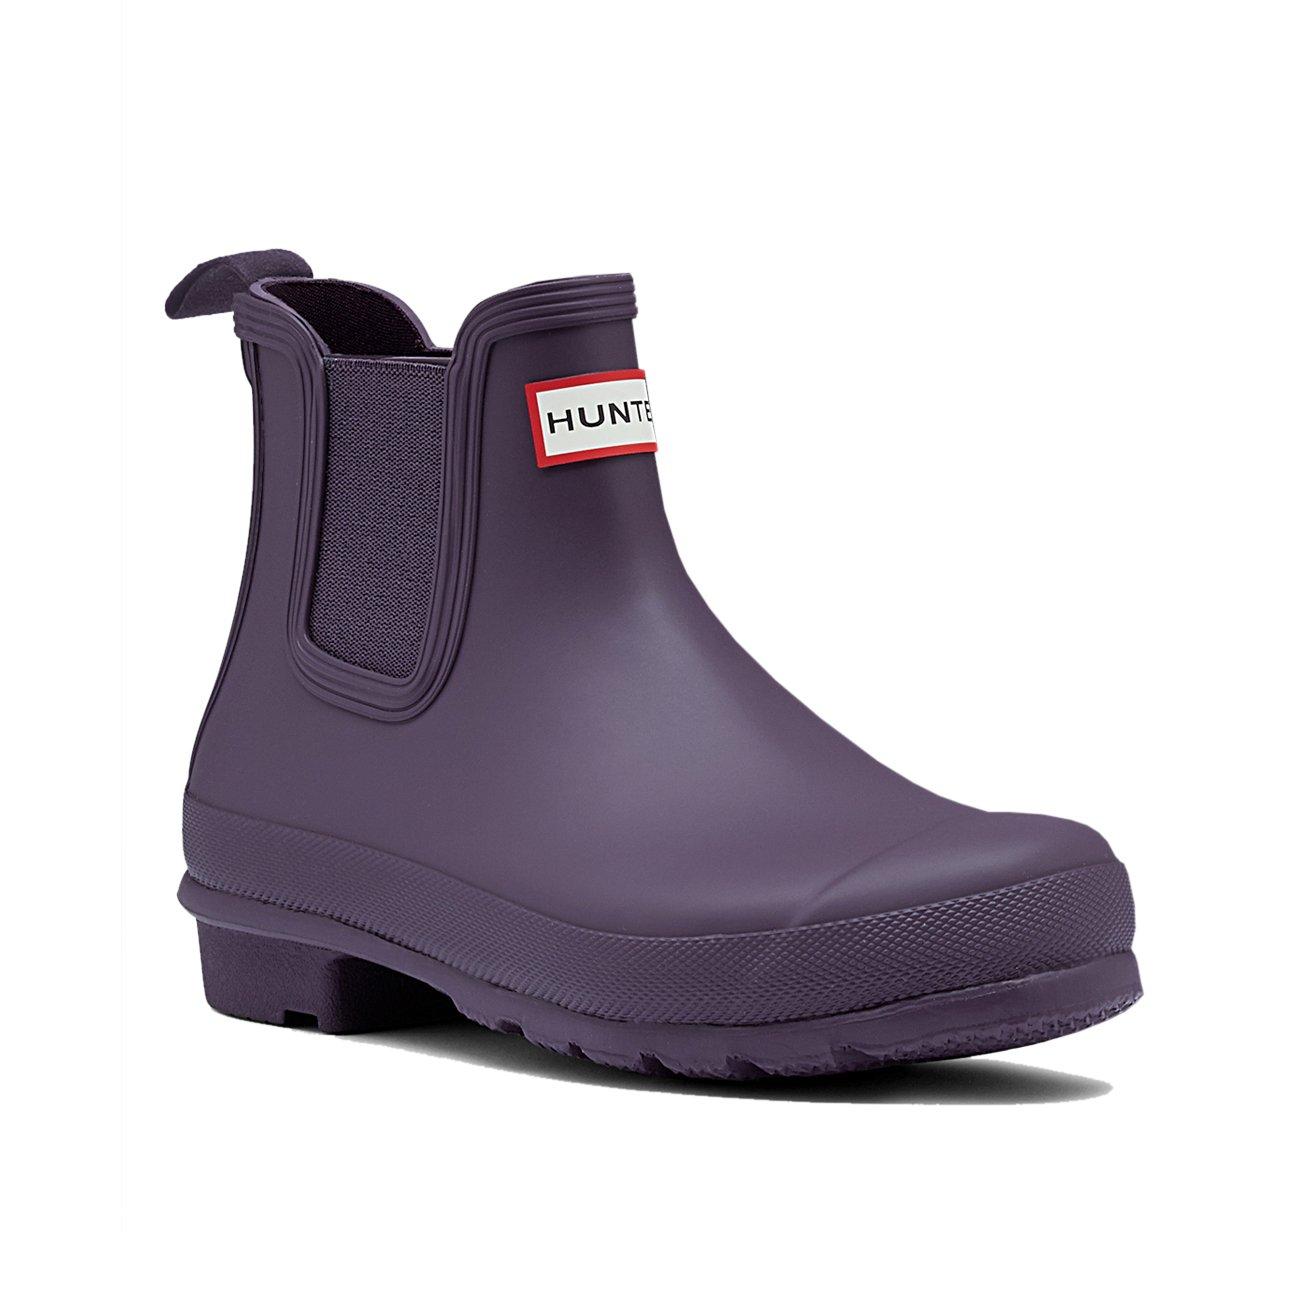 Womens Hunter Original Chelsea Wellingtons Waterproof Rain Ankle Boots B01JOU17HQ 5 M US|Purple Urchin